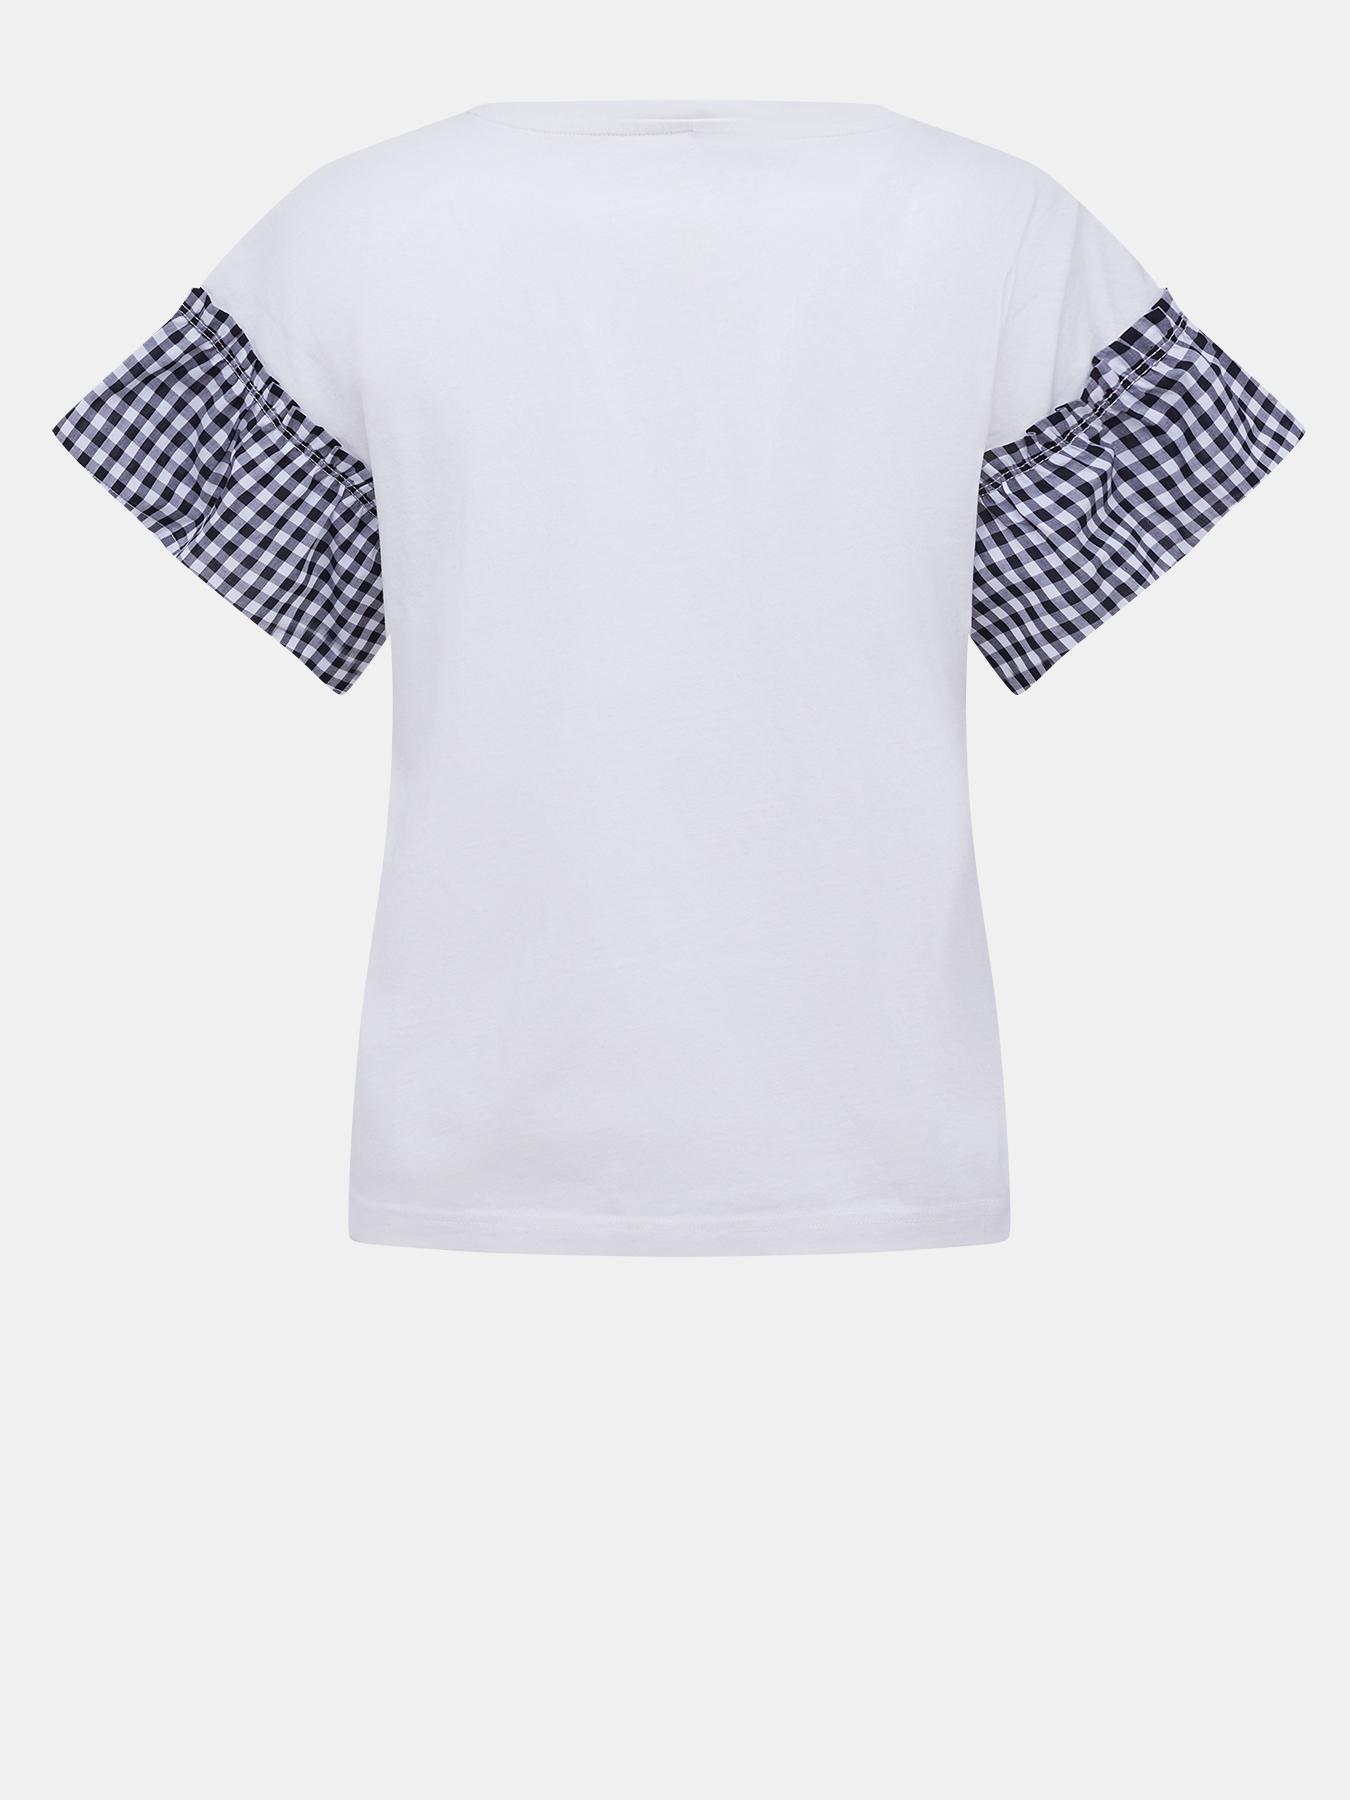 Фуфайка (футболка) Pennyblack Футболка цена 2017